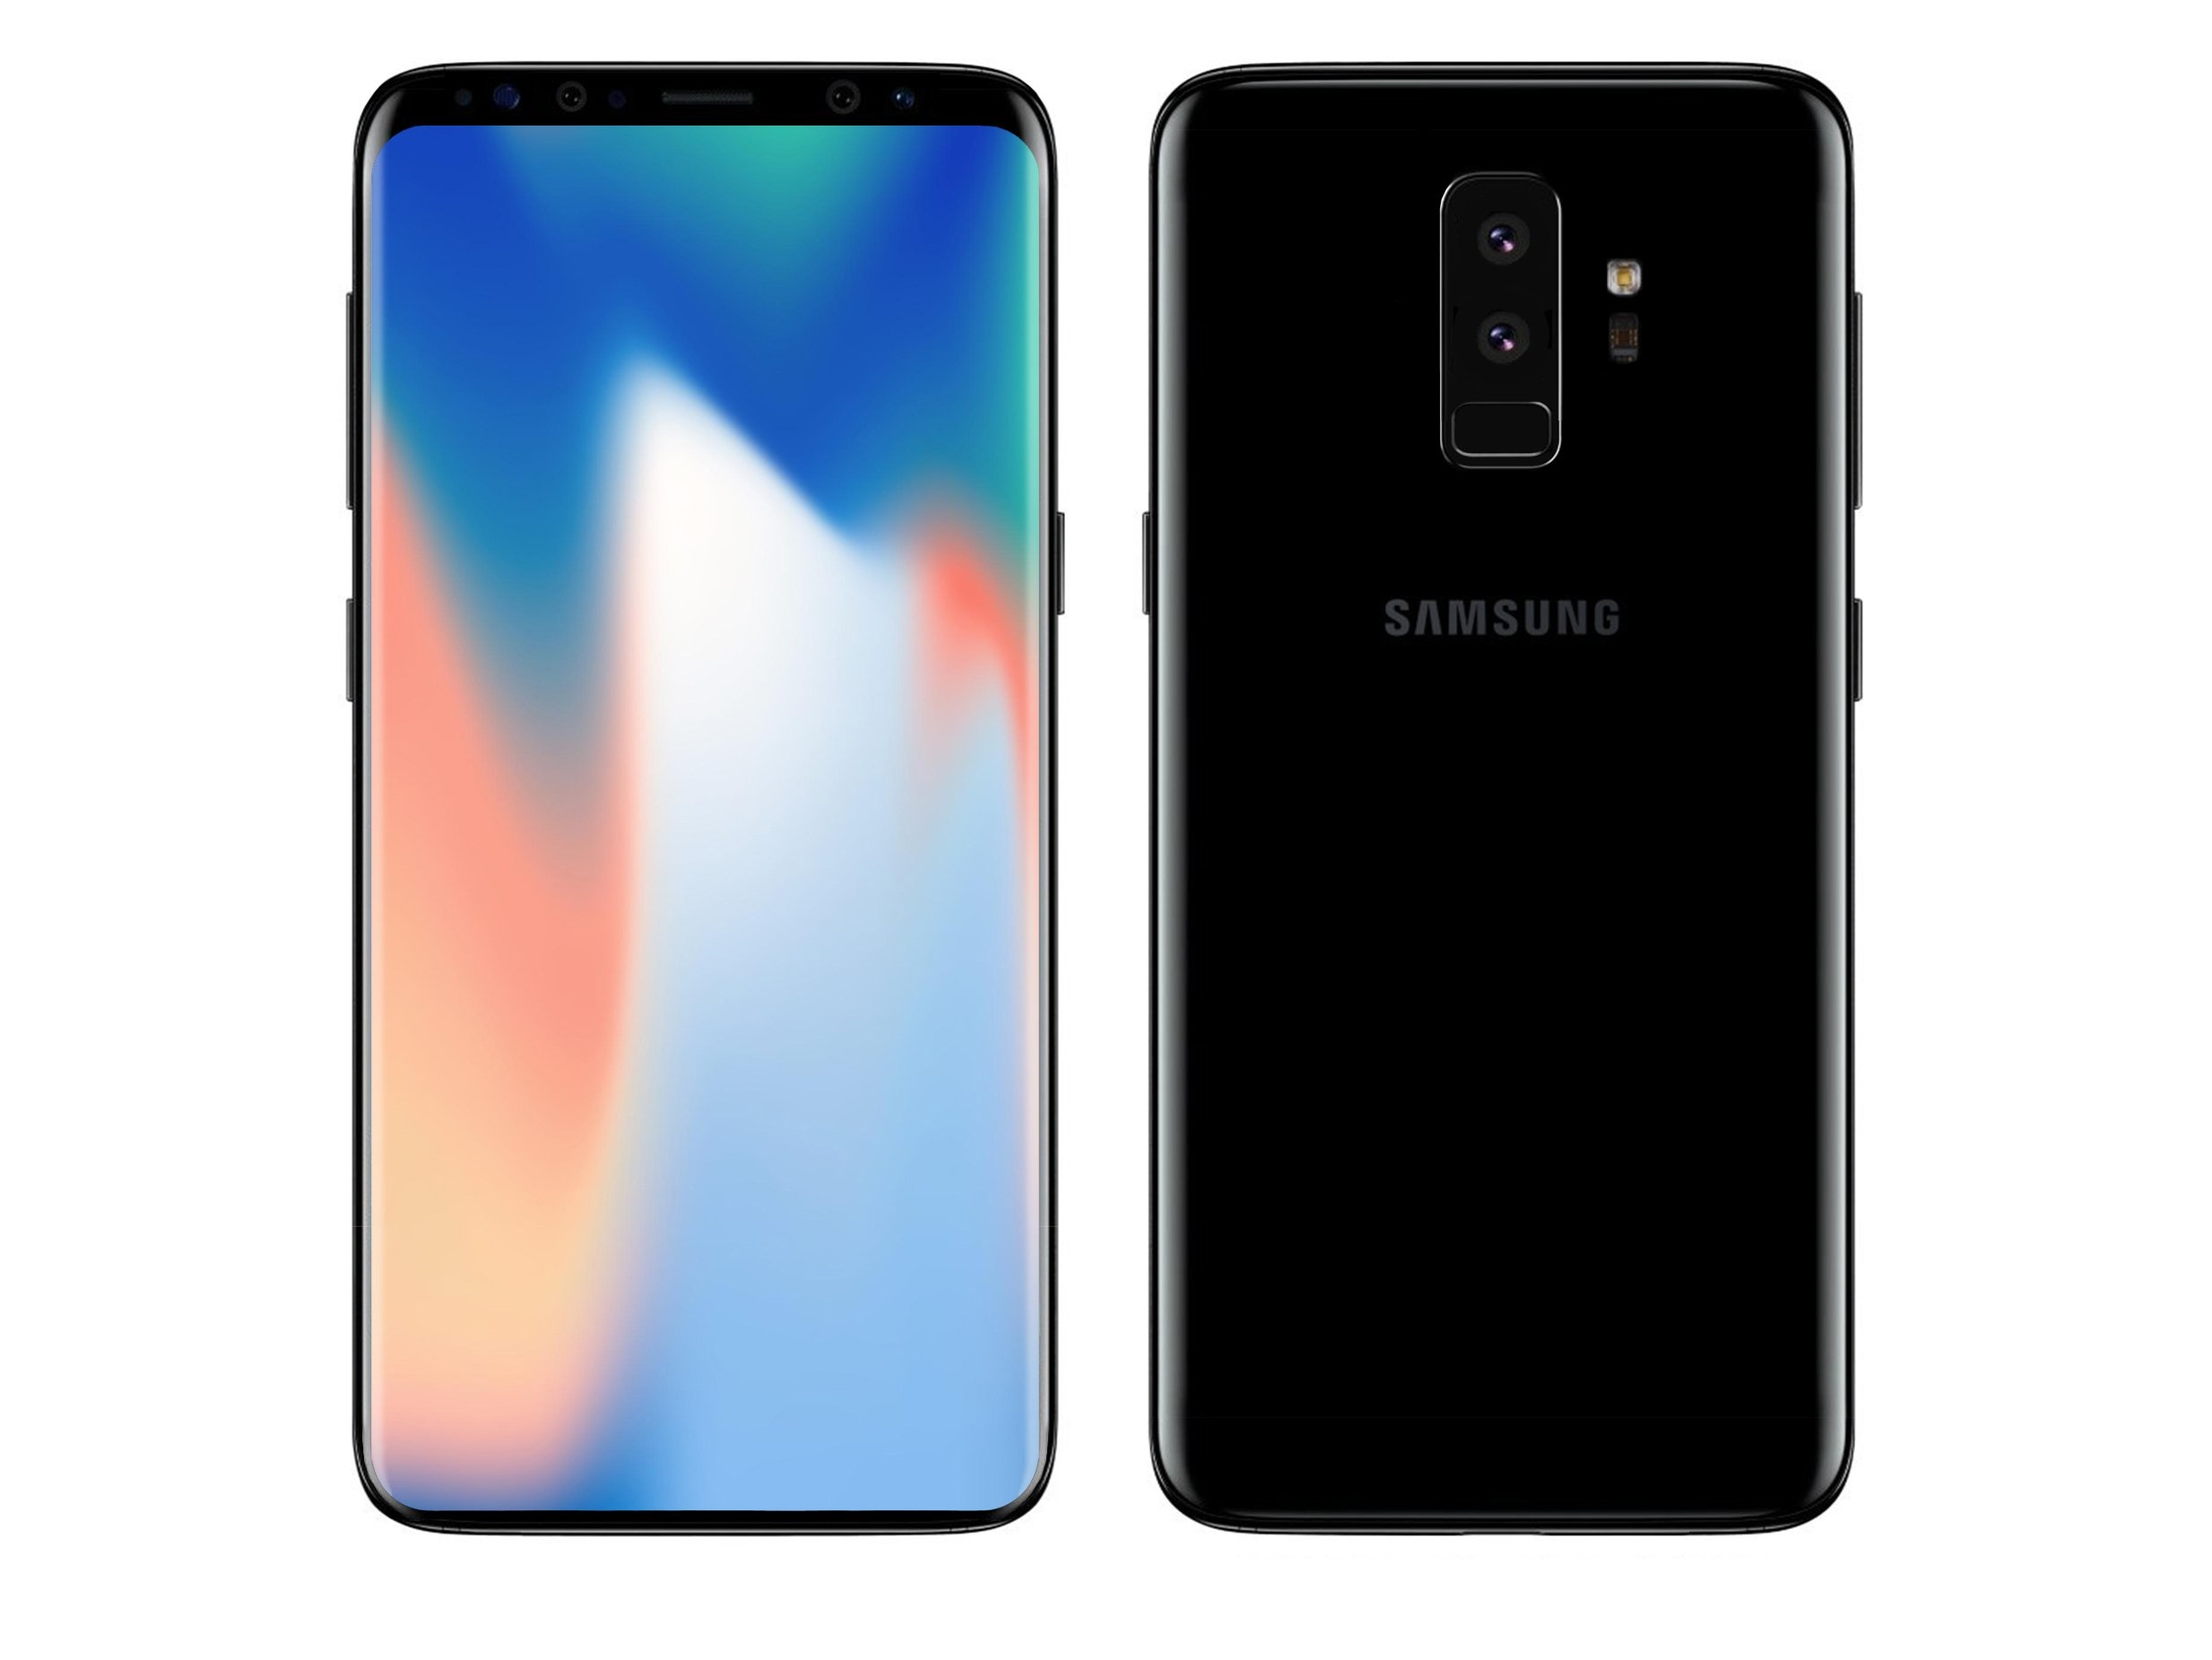 Samsung Galaxy S9 concept design final